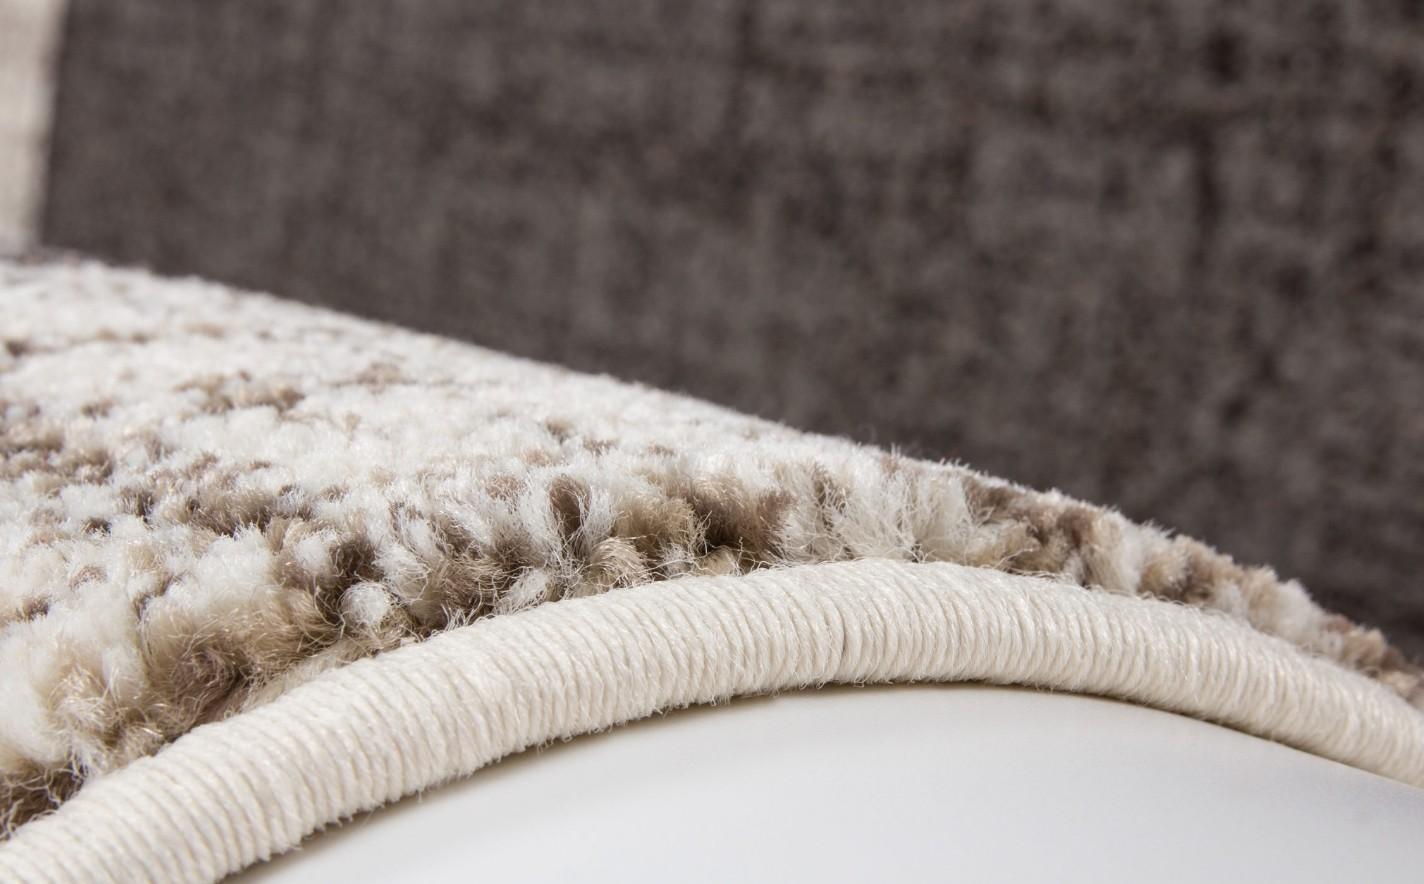 Carrelage design tapis salon beige moderne design pour carrelage de sol e - Tapis beige pas cher ...